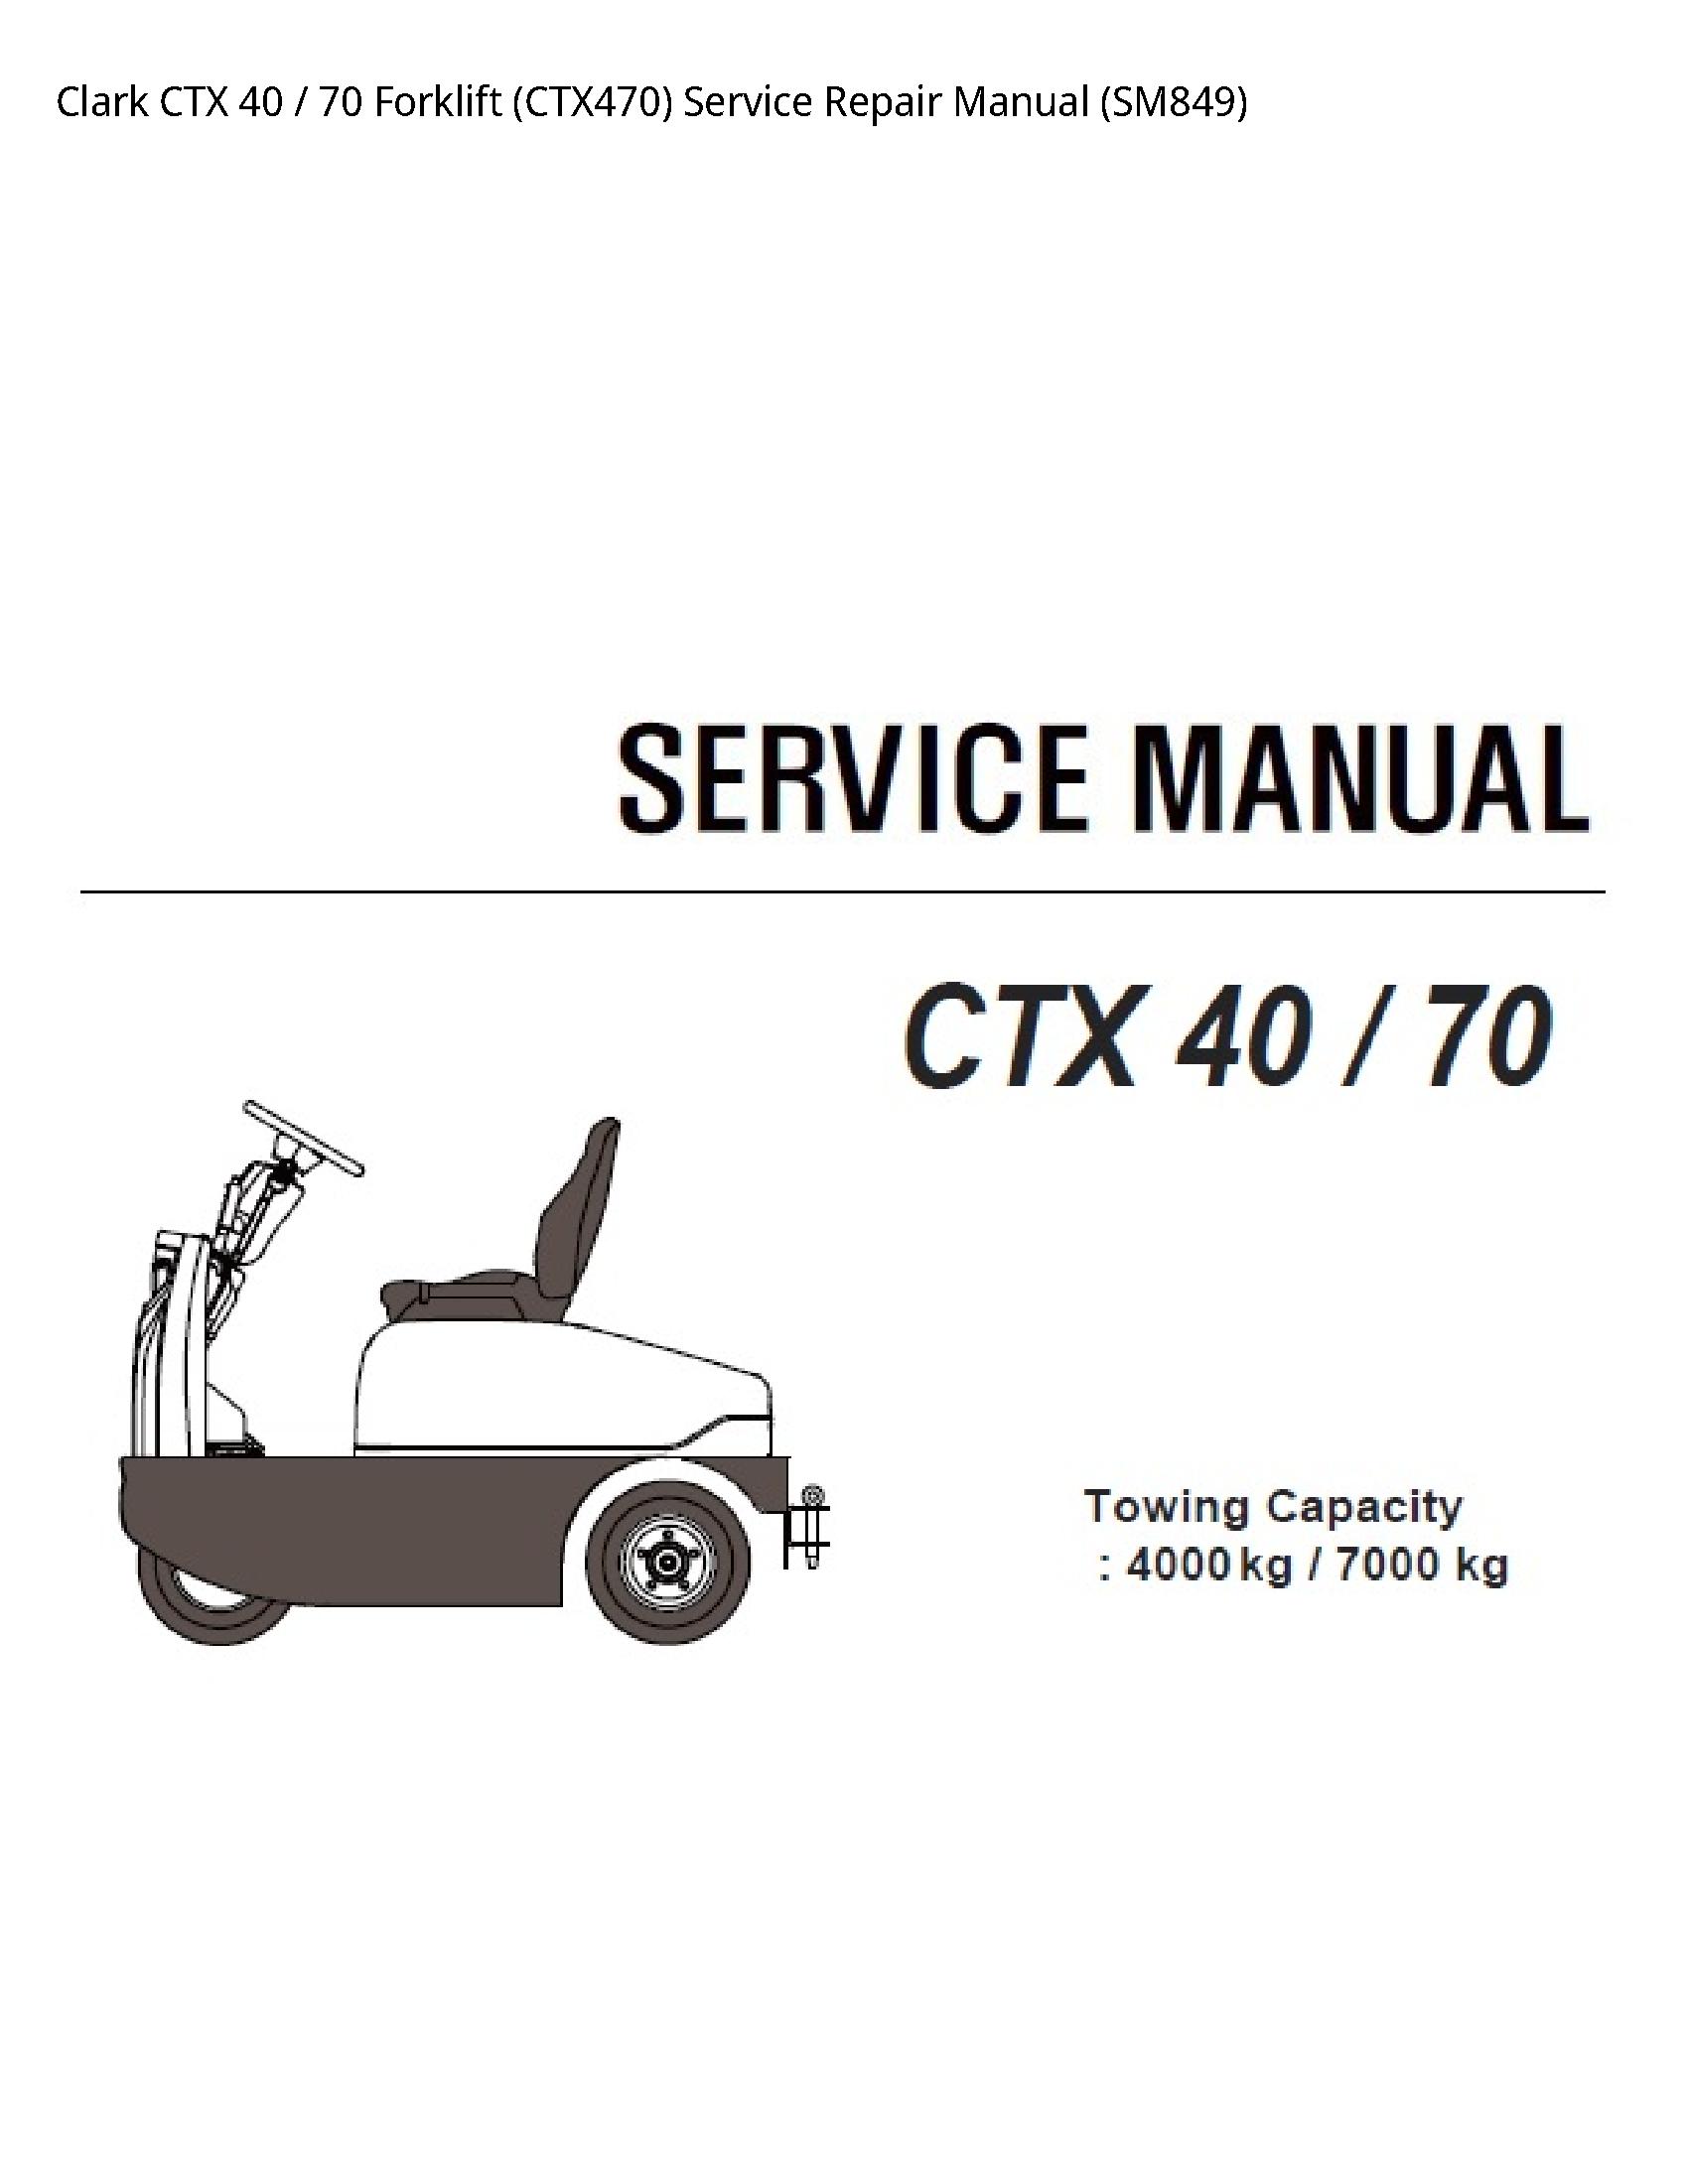 Clark 40 CTX Forklift manual